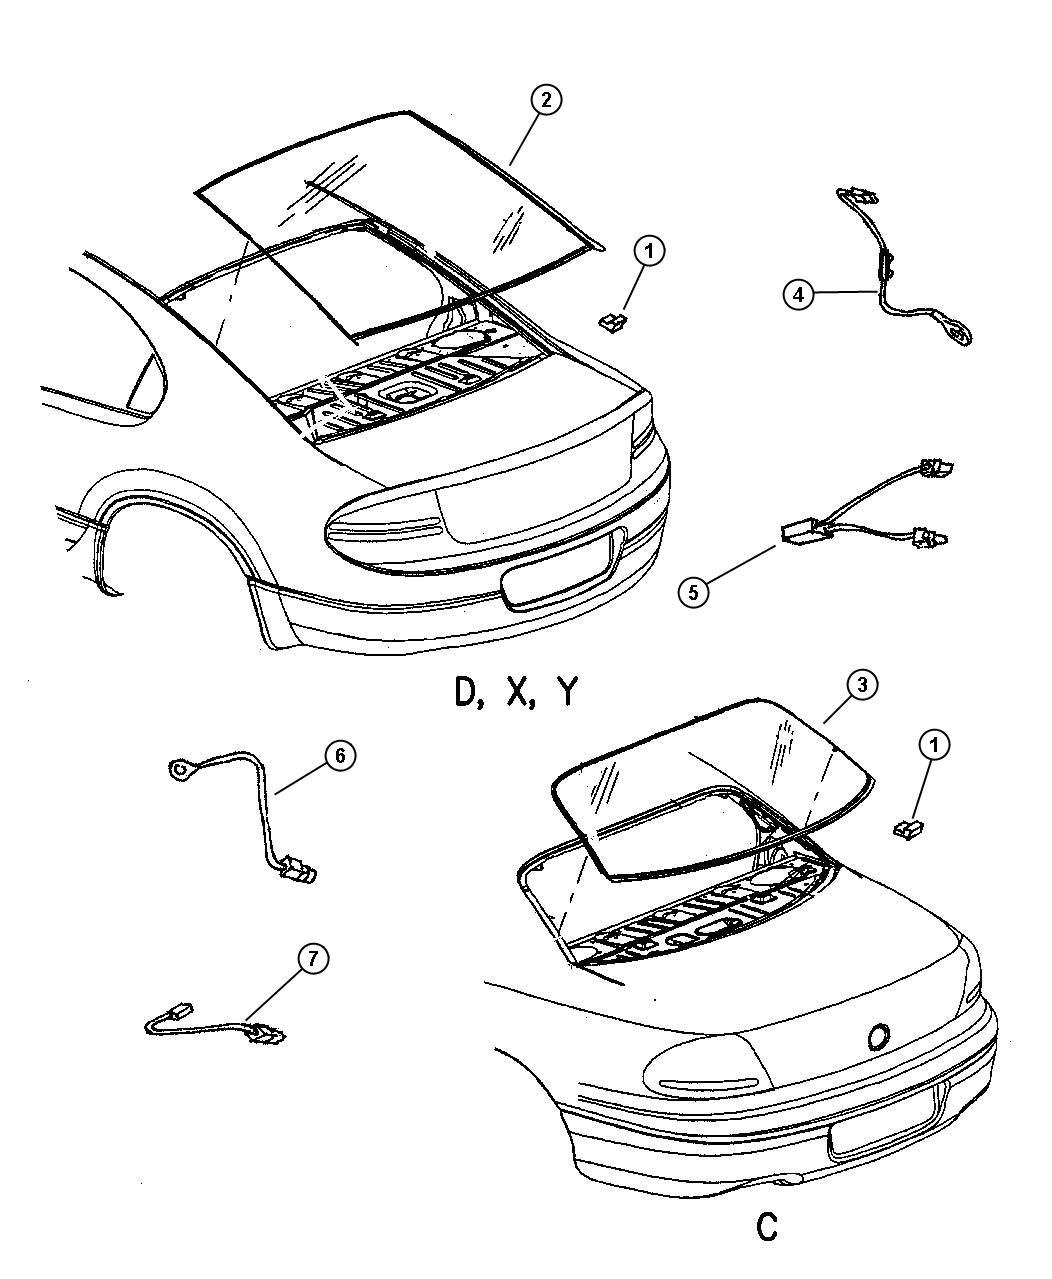 Dodge Intrepid Wiring. Electric backlight ground. Ebl